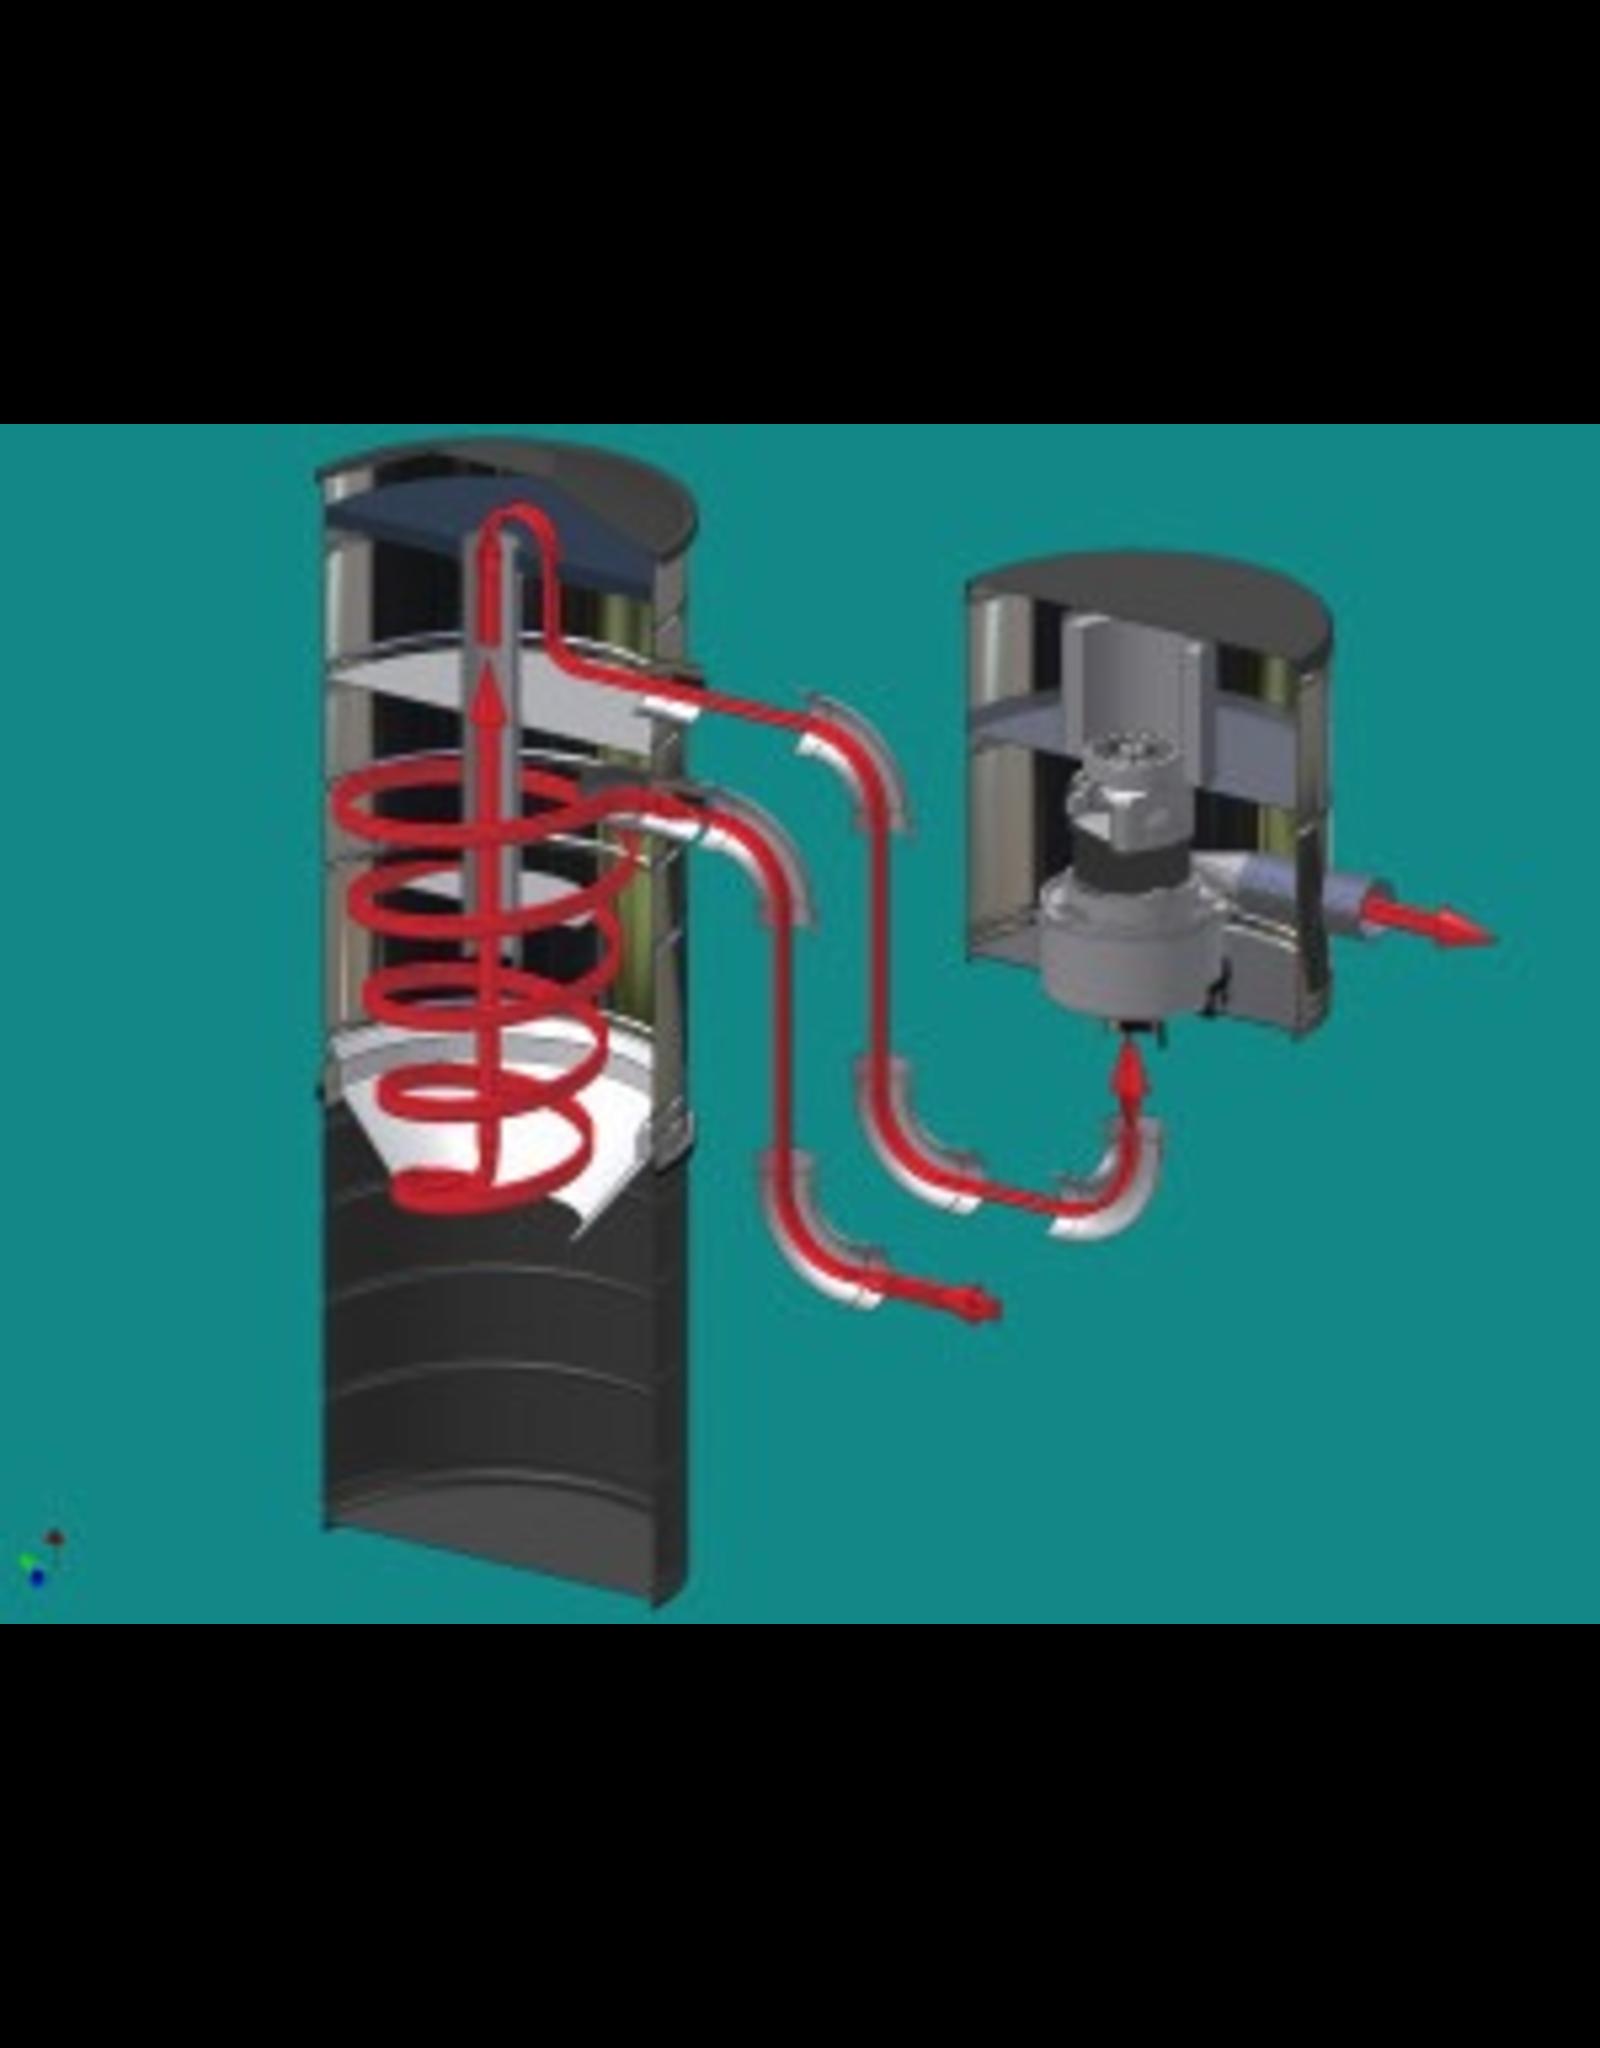 VacuMaid VacuMaid S1660 Cyclonic Power Unit